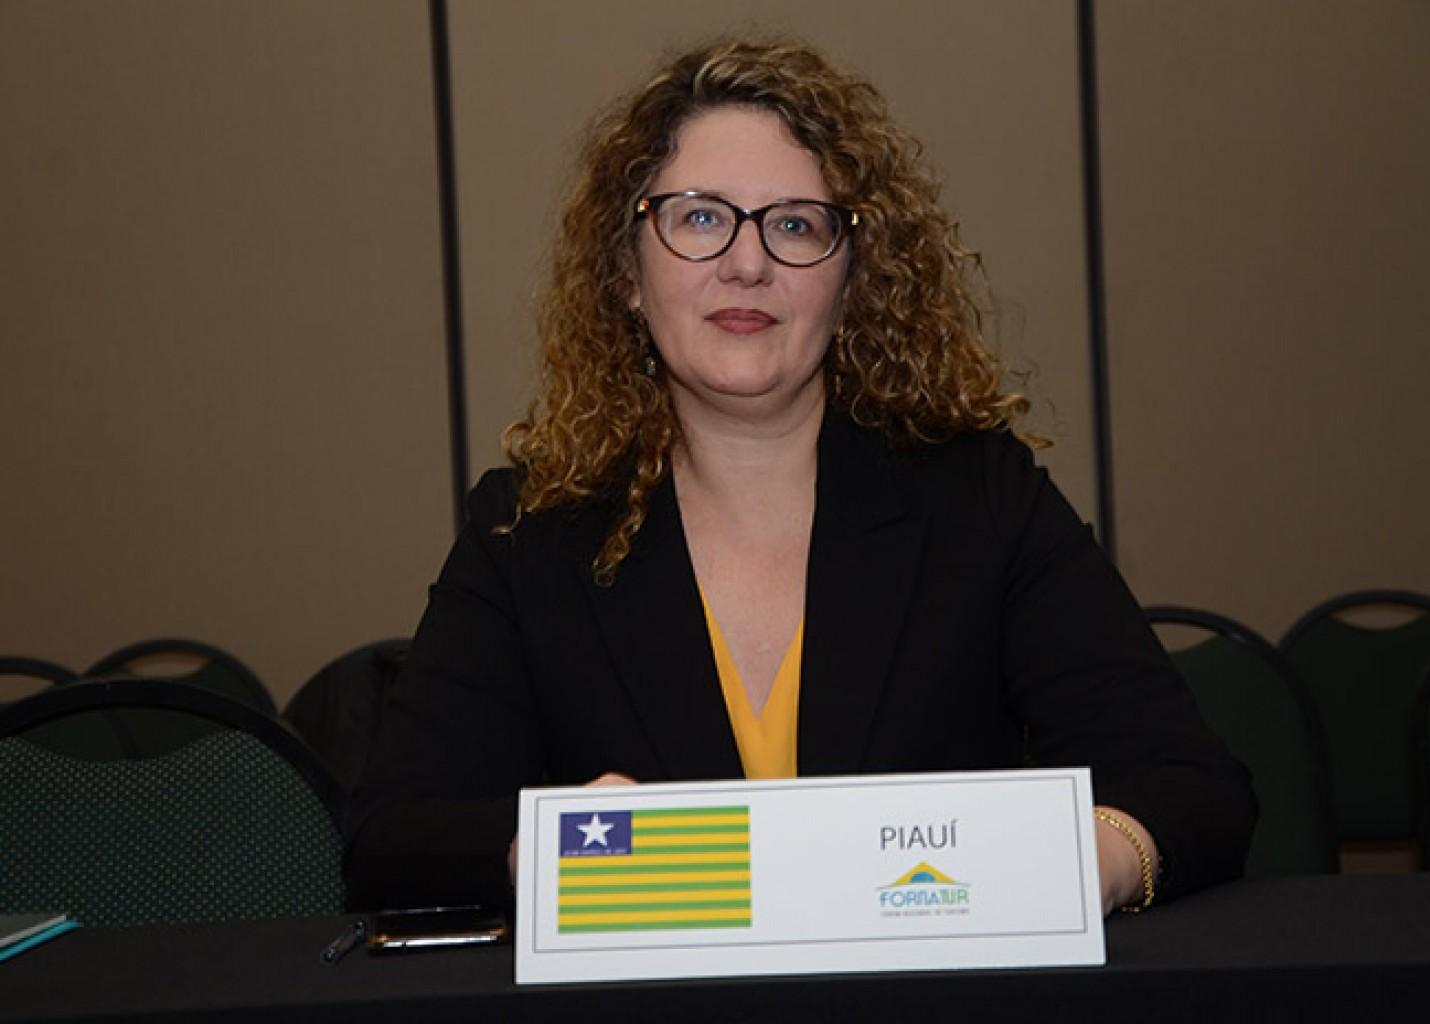 VEJA COMO FOI – M&E Play entrevista superintendente de Turismo do Piauí